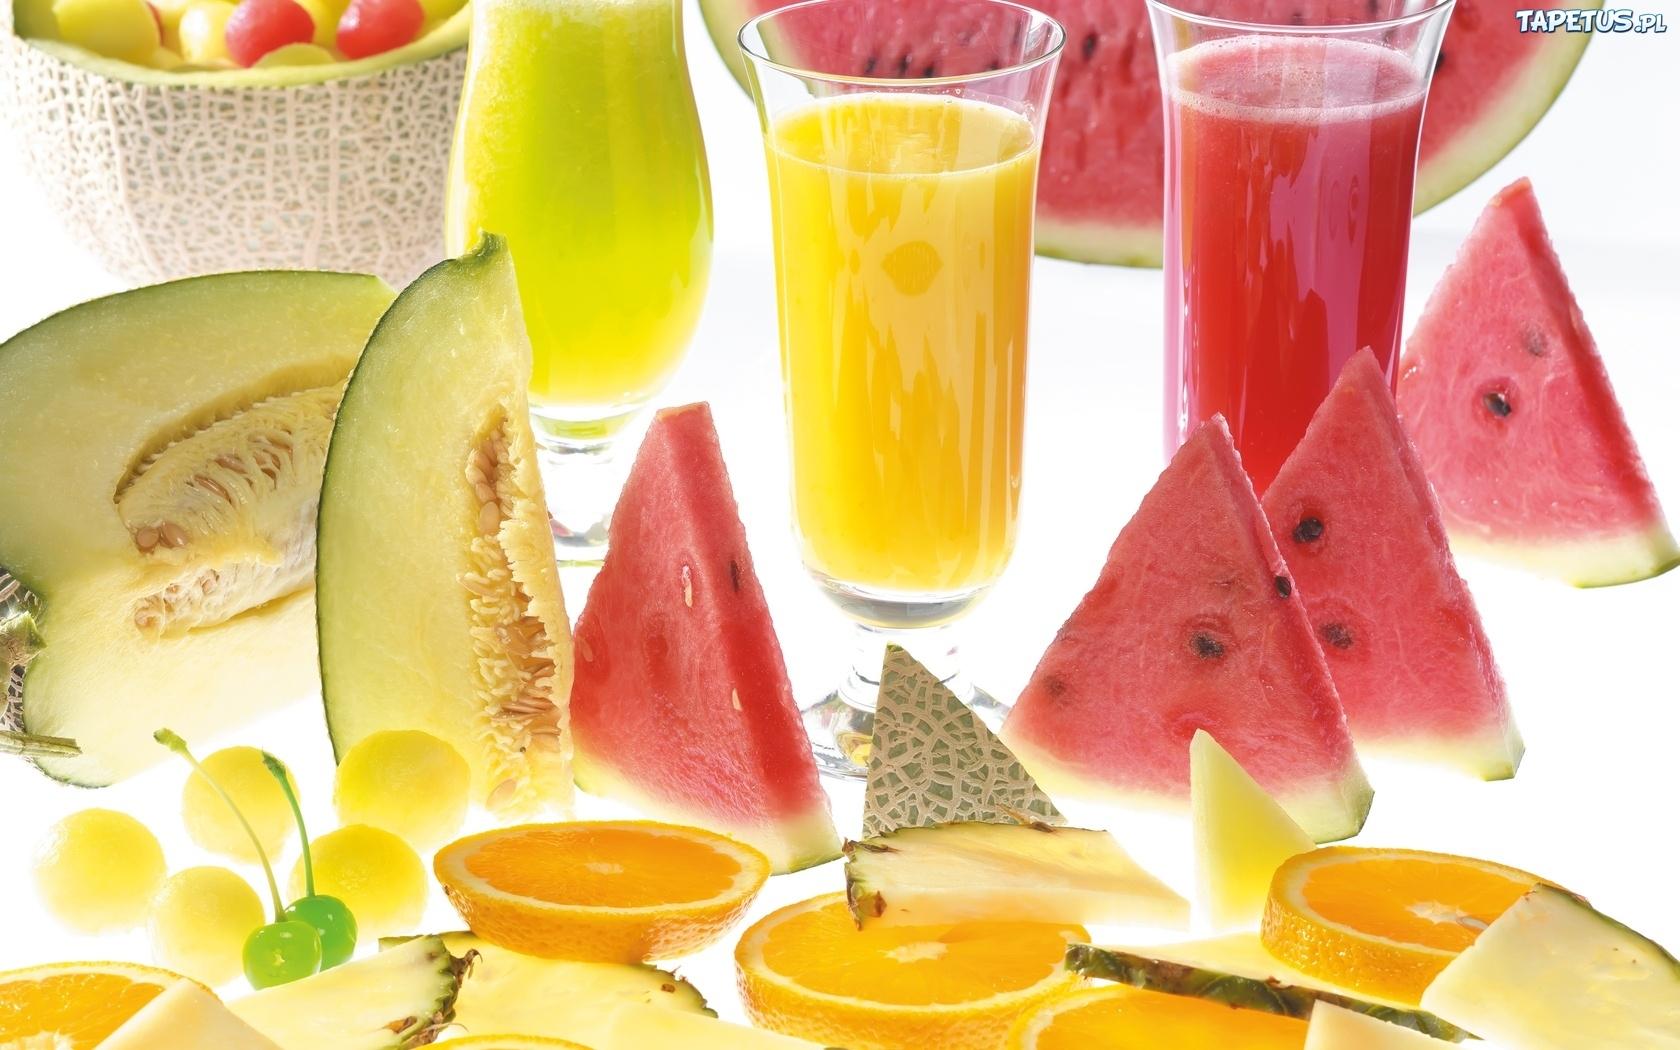 koktajle-owocowe-arbuz-melon